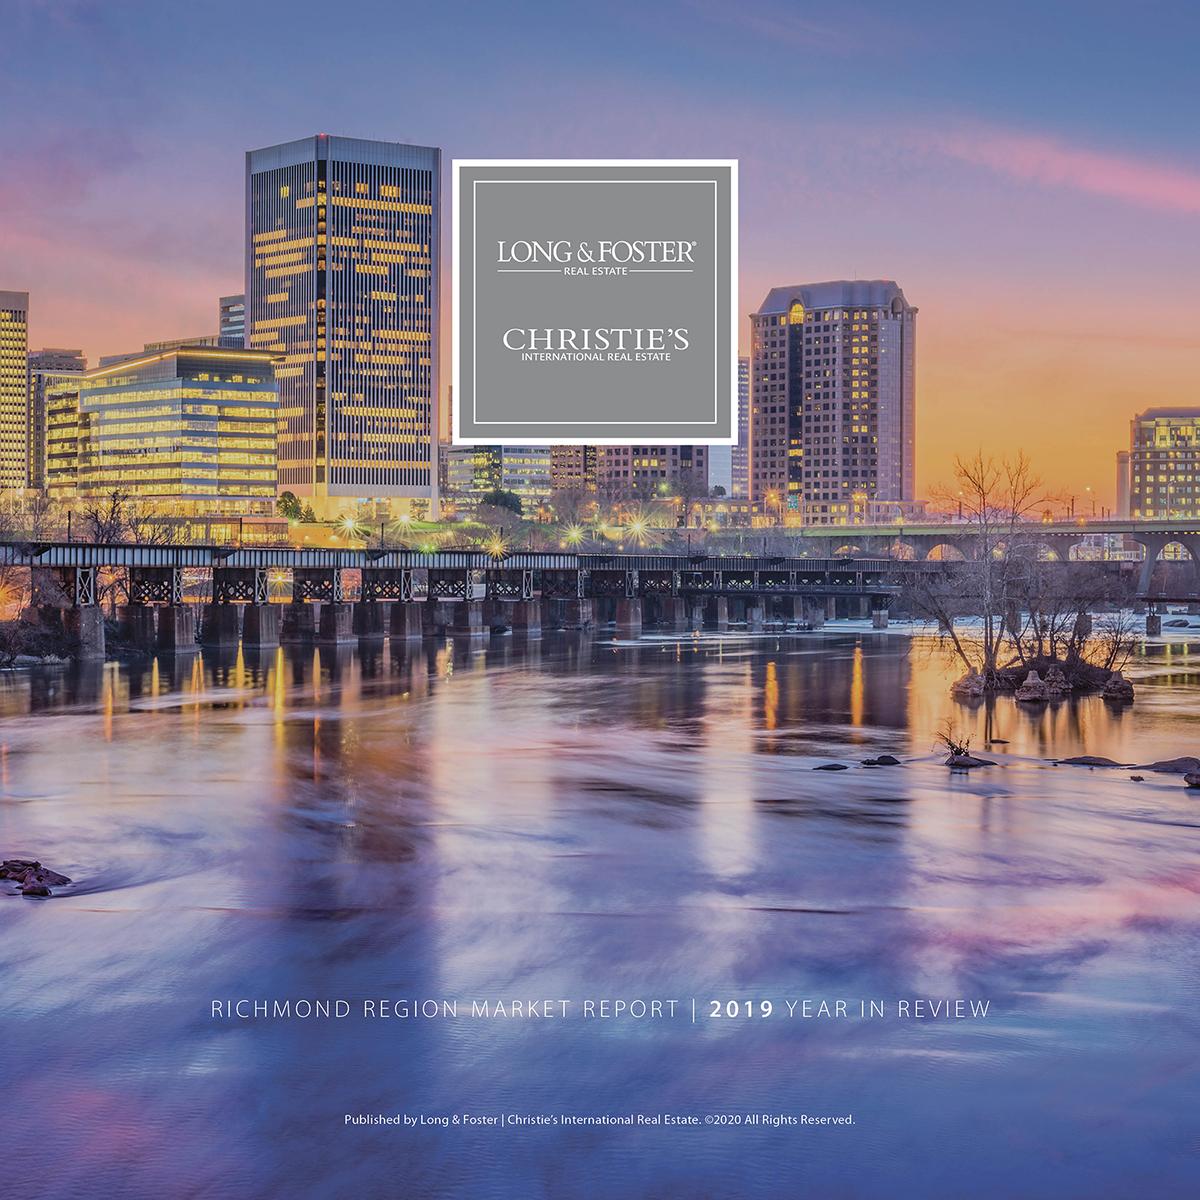 Richmond Region Market Report